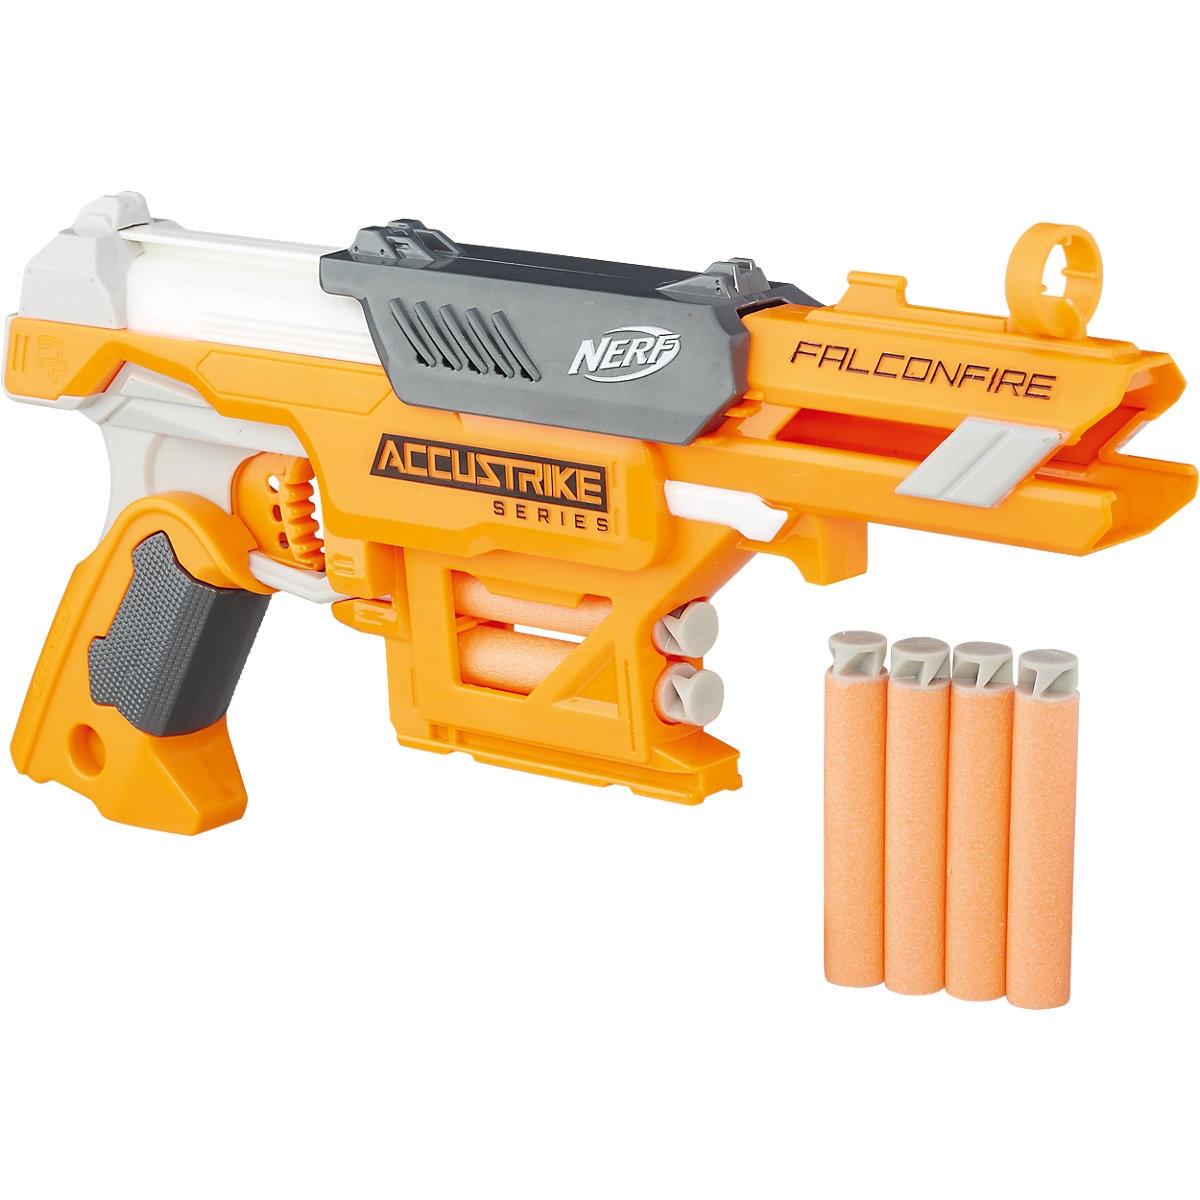 NERF jouet pistolets 5104312 pistolet arme jouets jeux pneumatique blaster garçon orbiz revolver plein air plaisir sport MTpromo